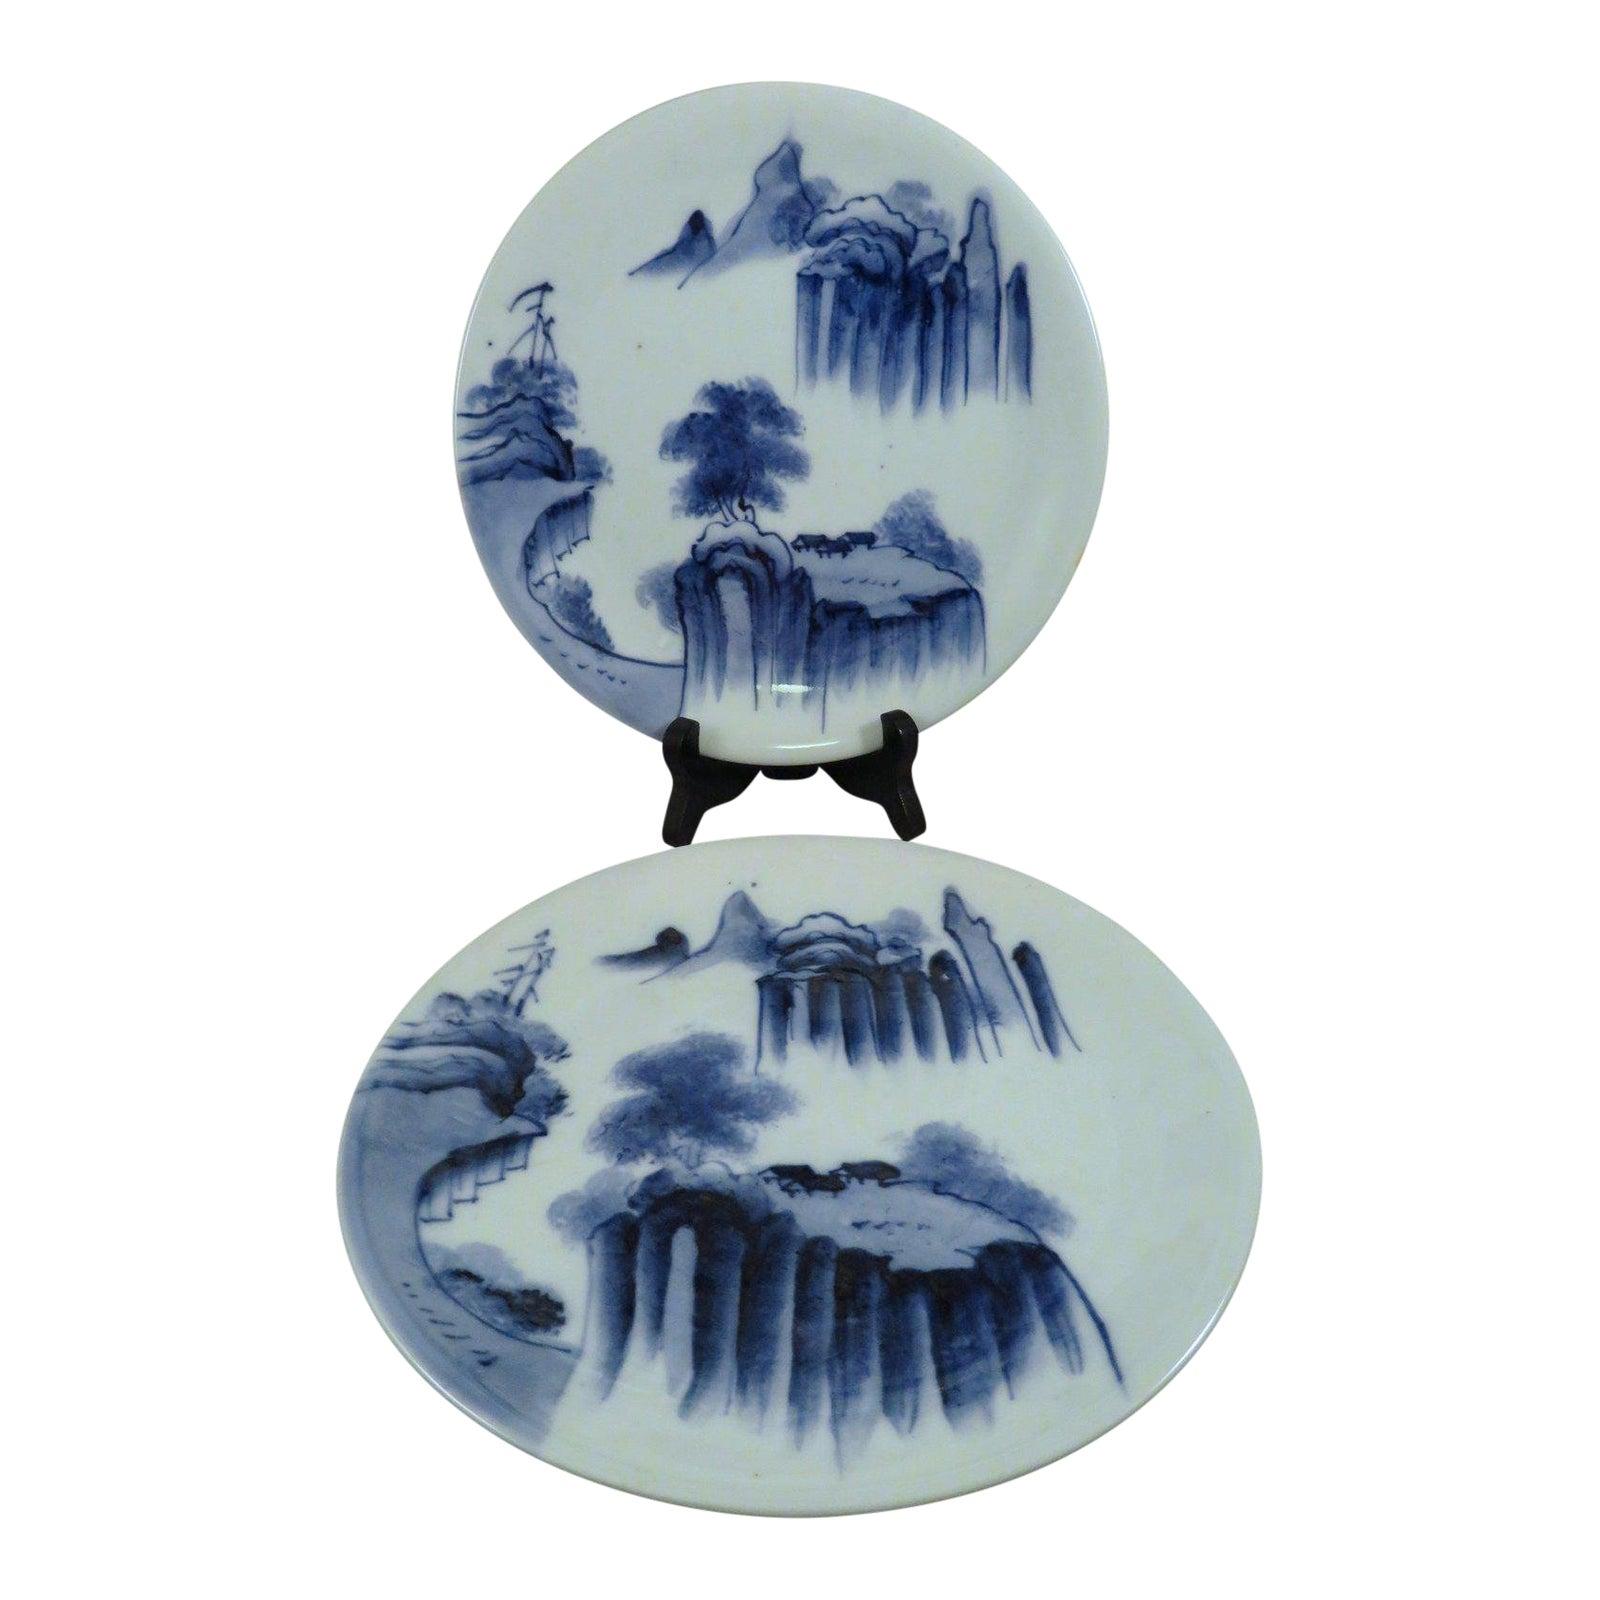 Antique Asian Blue & White Scenic Porcelain Plates - a Pair | Chairish